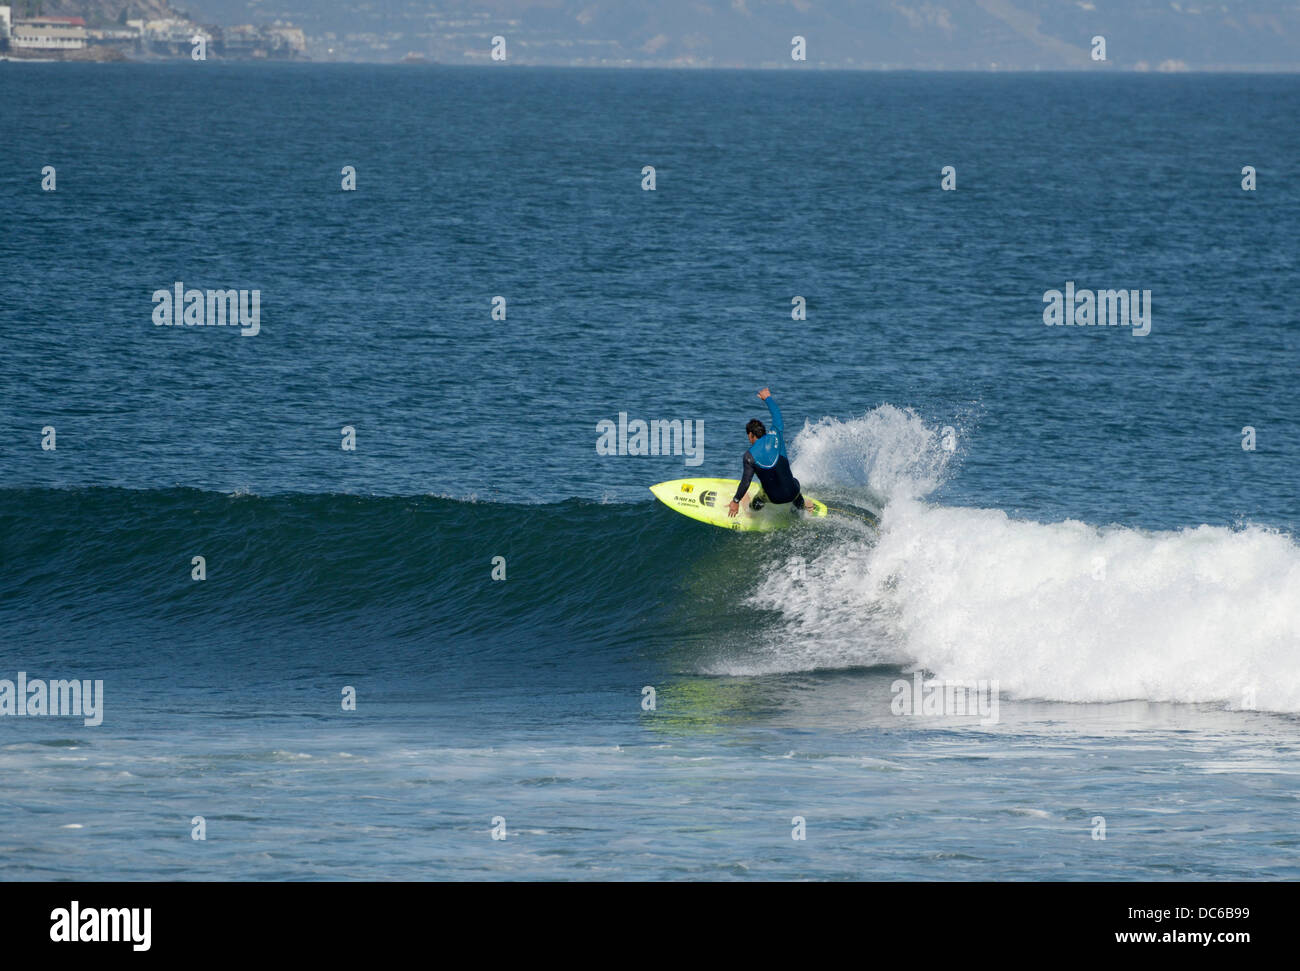 Lone surfer riding a wave, Surfrider Beach, Malibu, CA - Stock Image